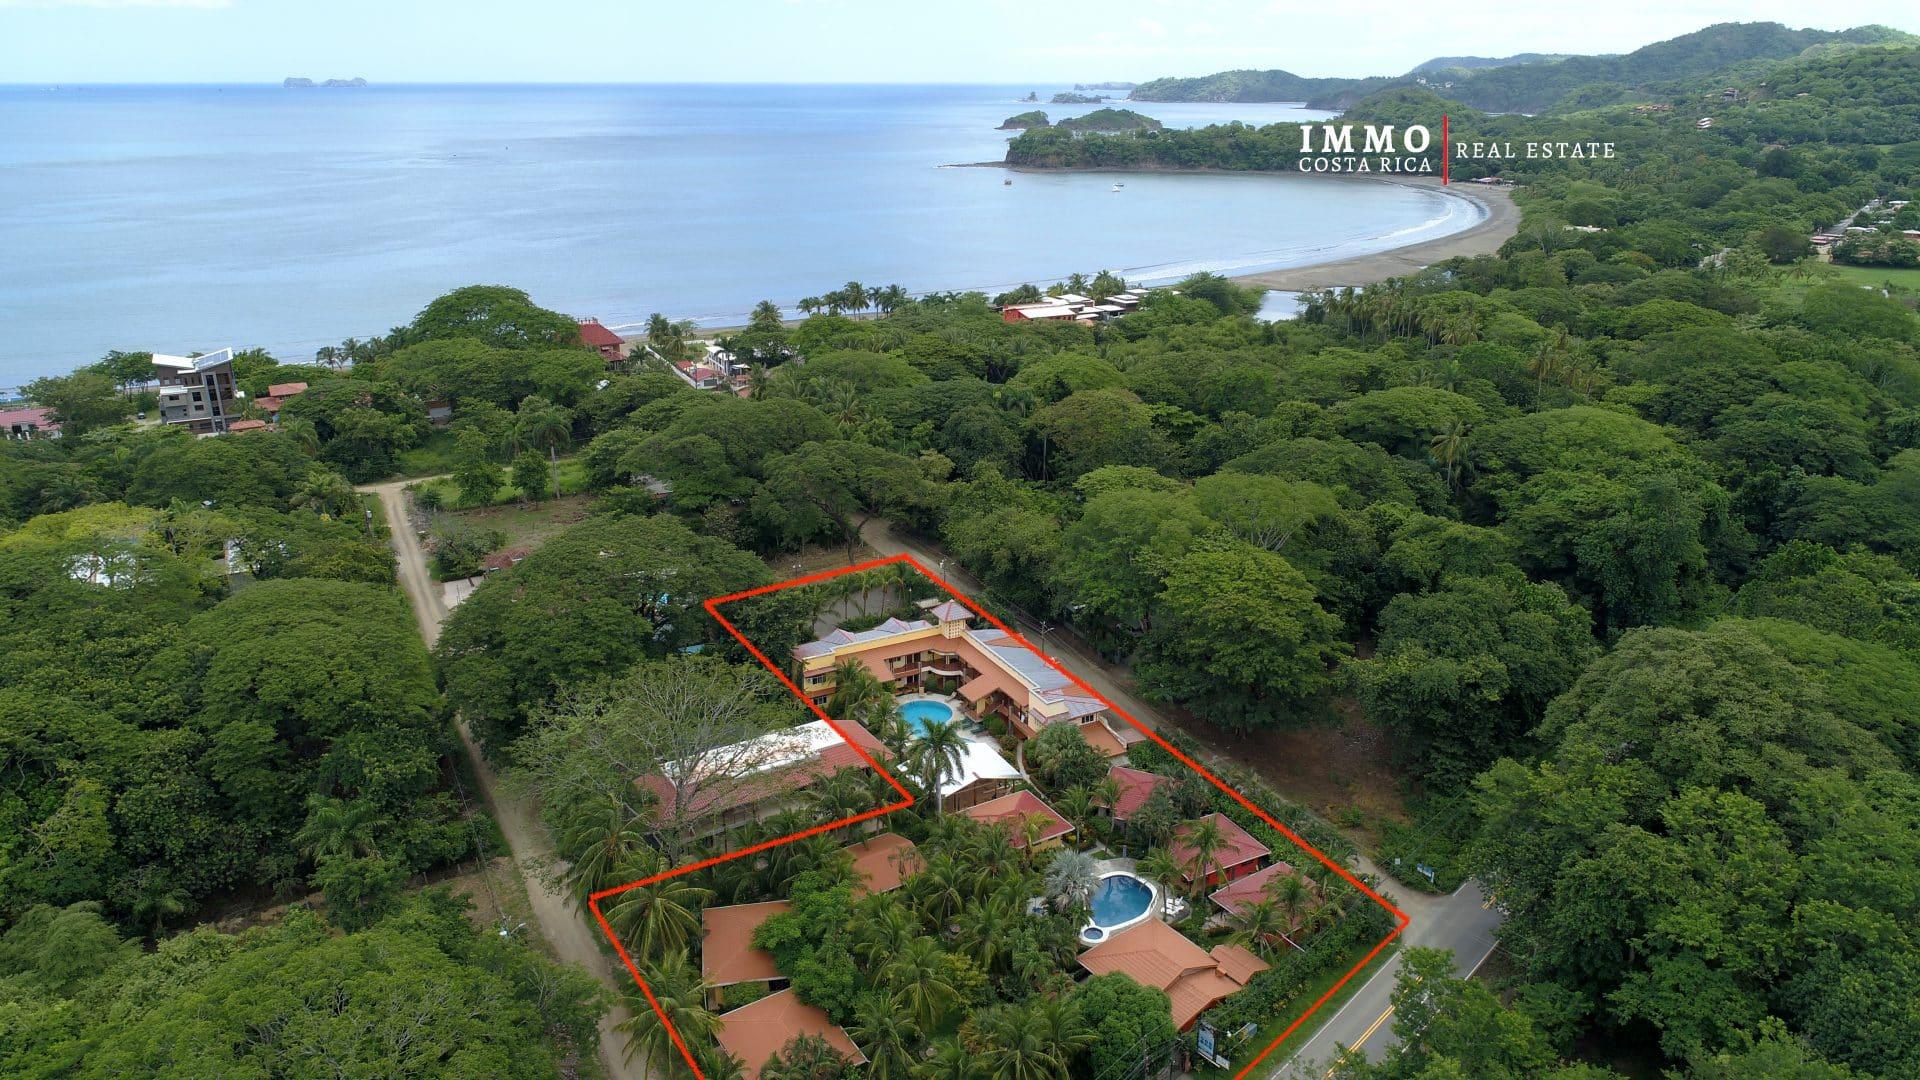 Hotel à Playa Potrero, 20 chambres et 8 Villas à 100 m de la Mer.